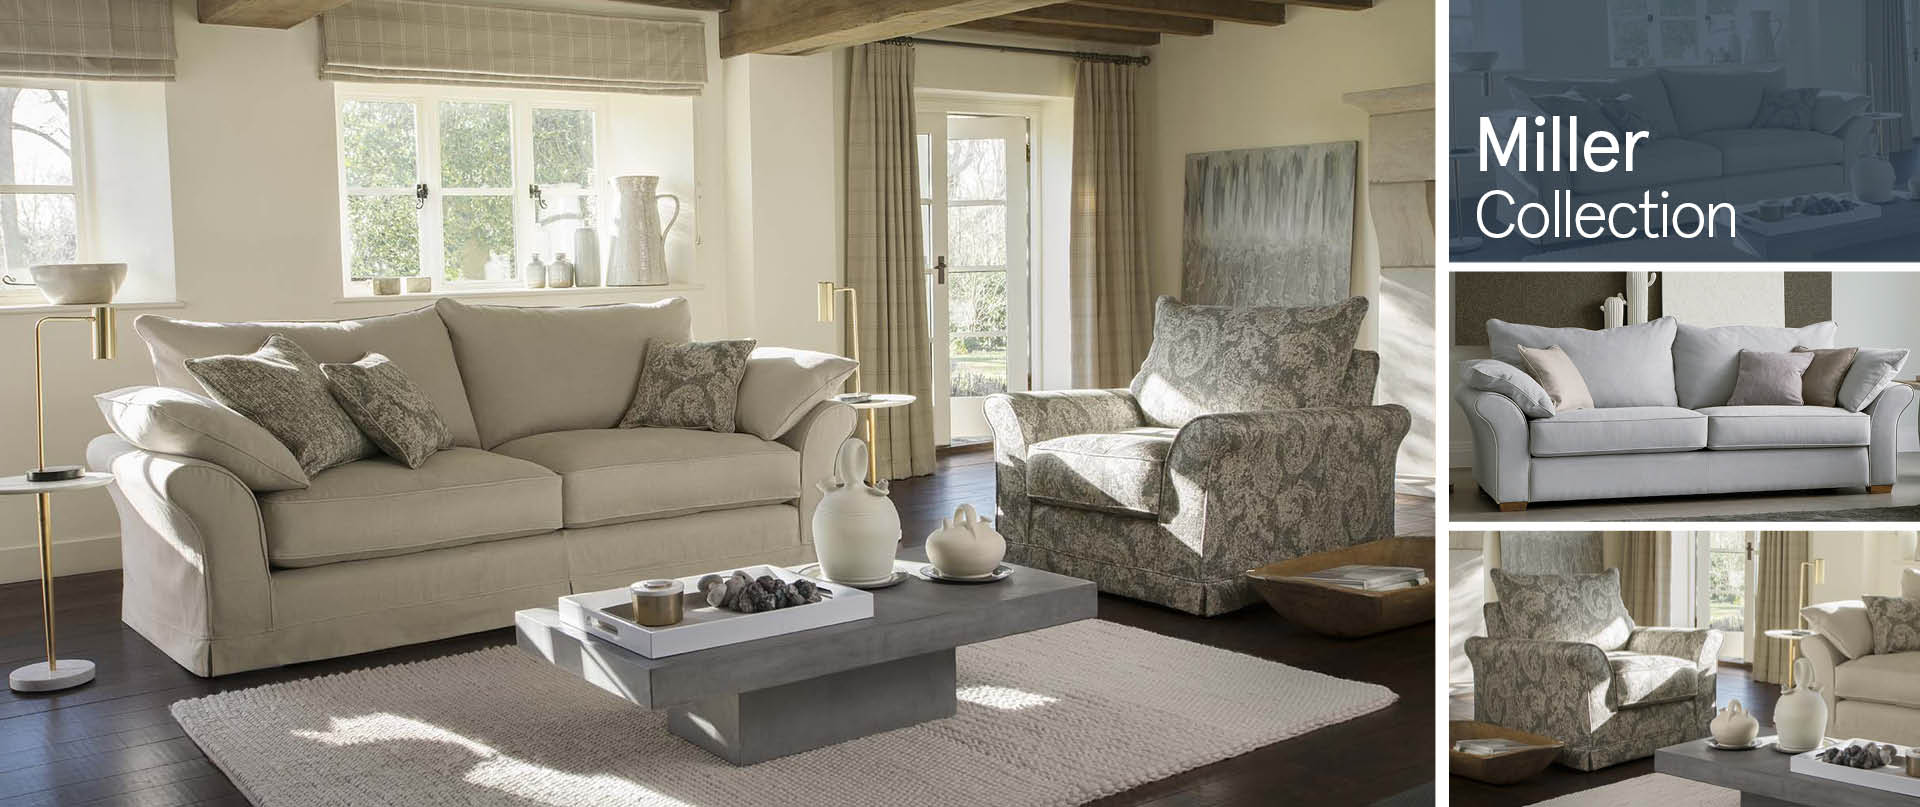 Miller Fabric Sofas Ranges